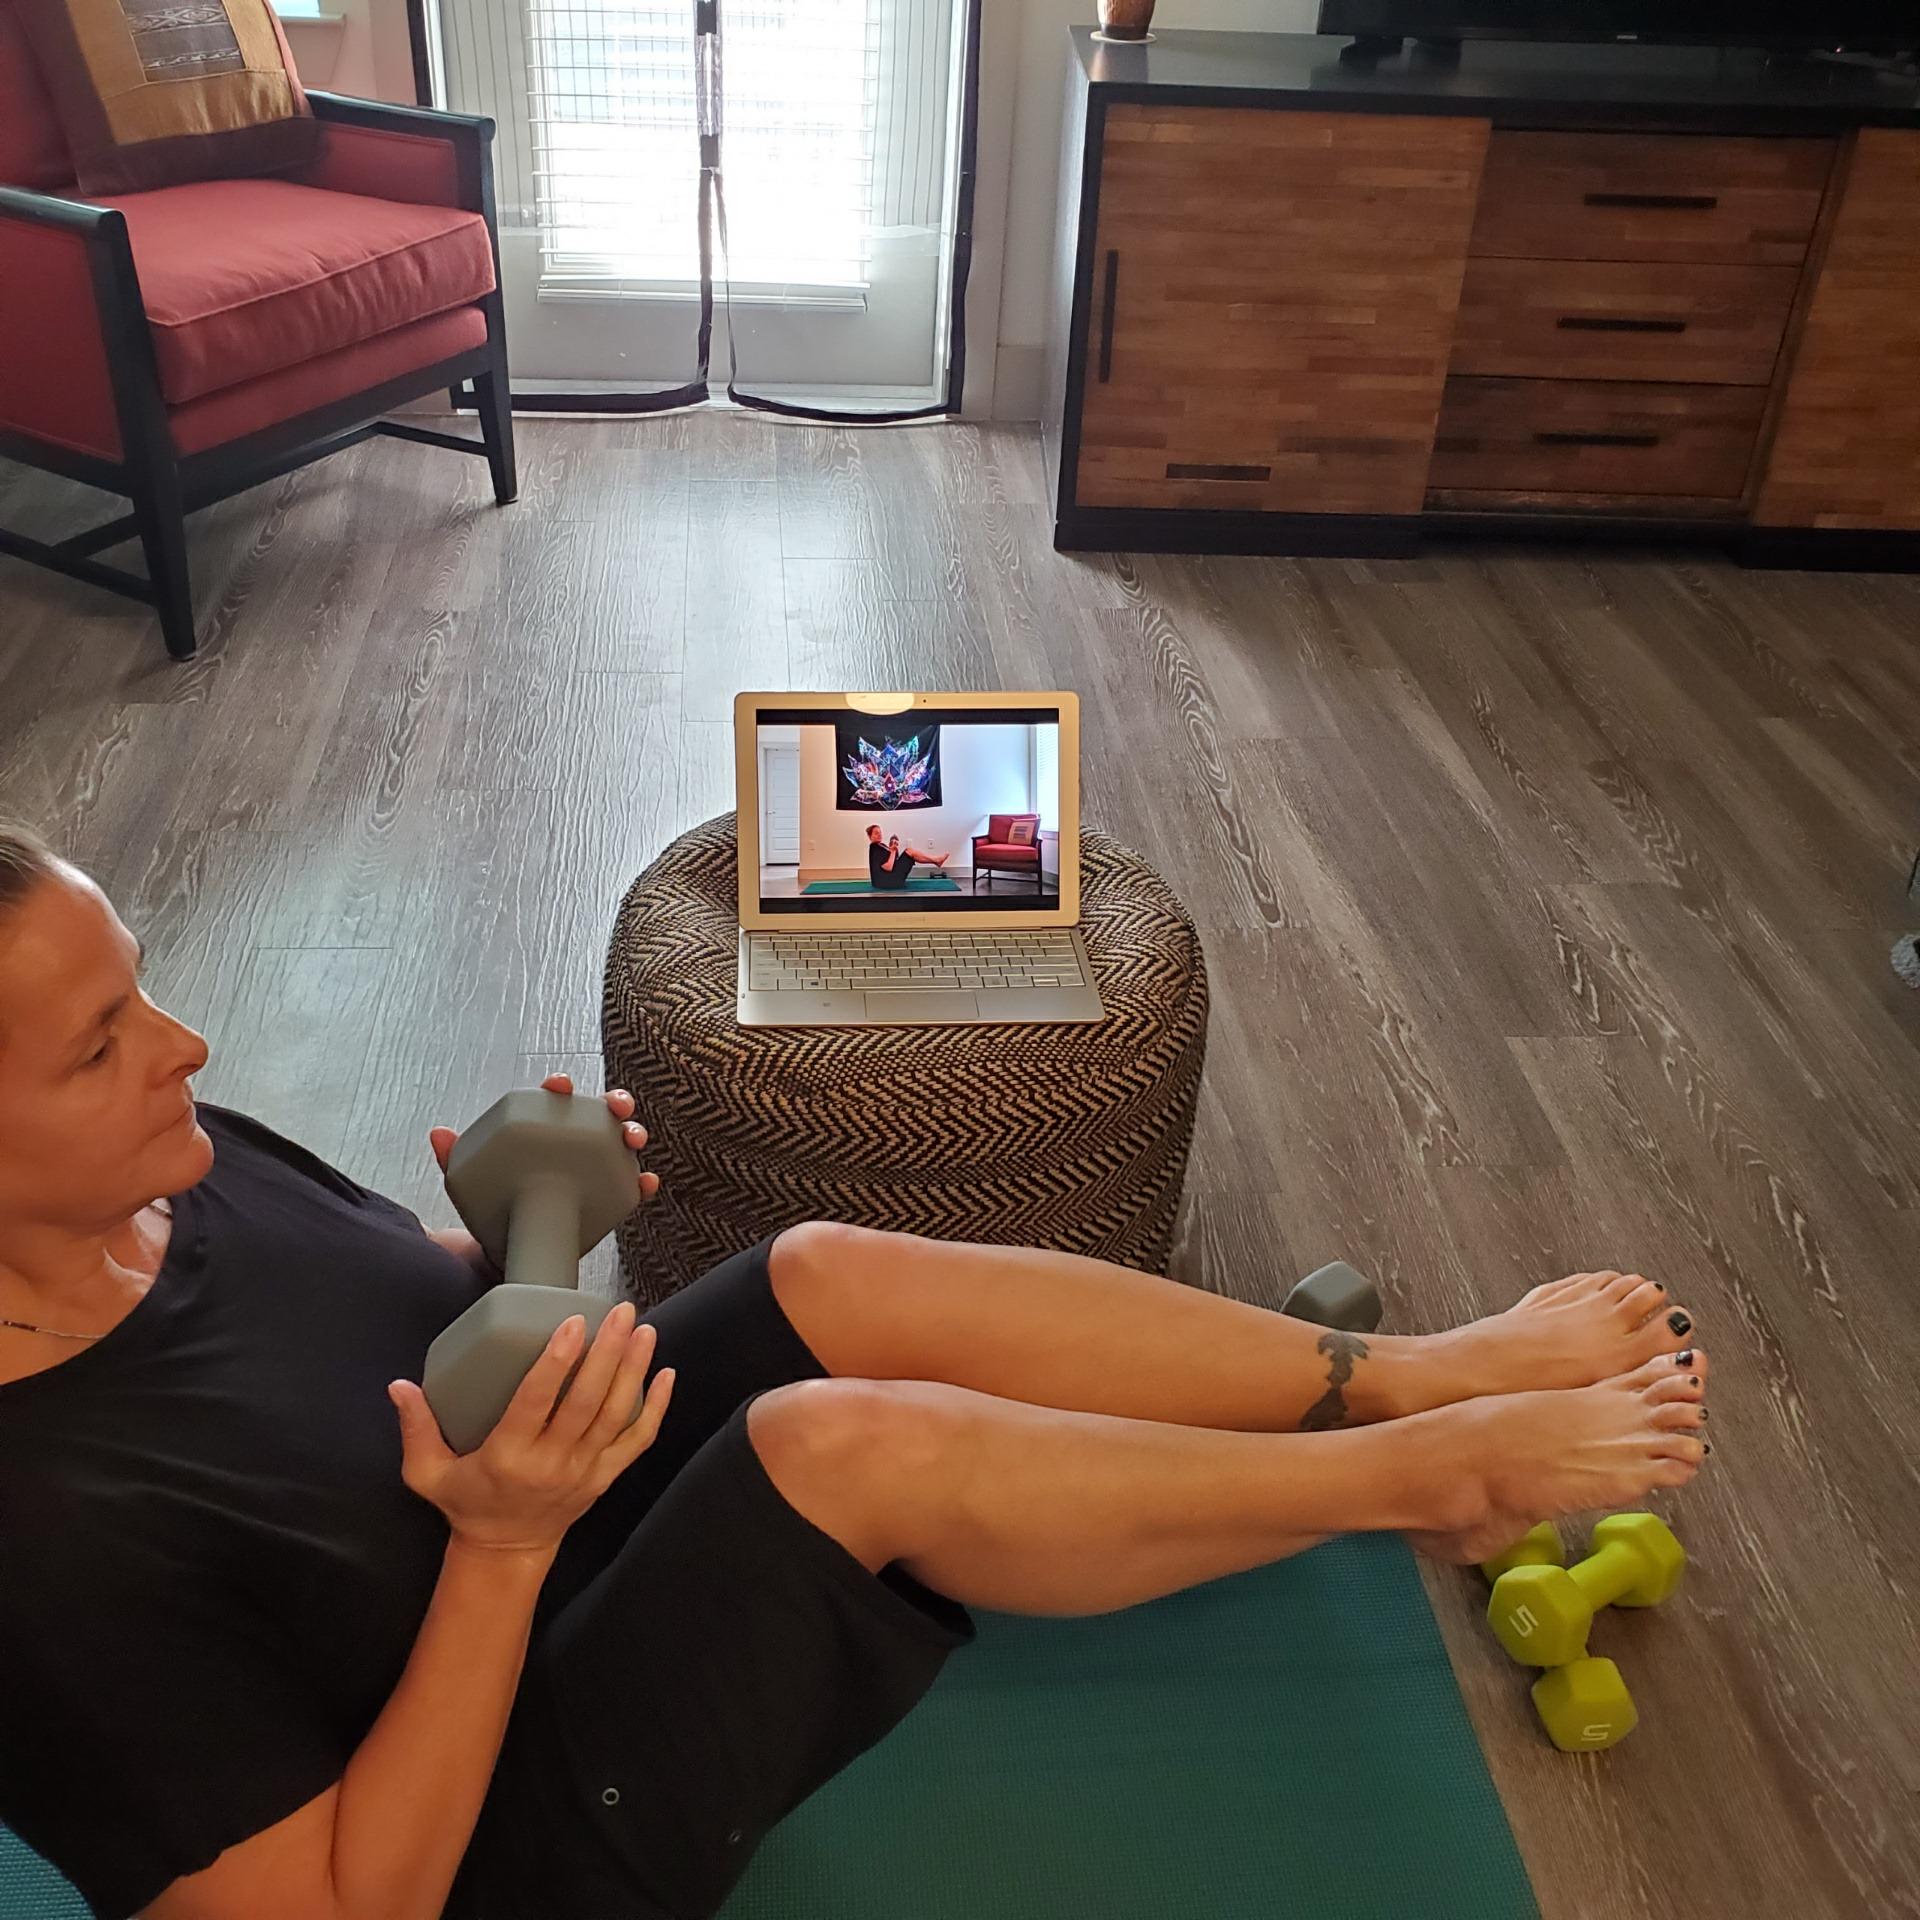 Online 300-Hour Yoga Teacher Training Yoga with Weight